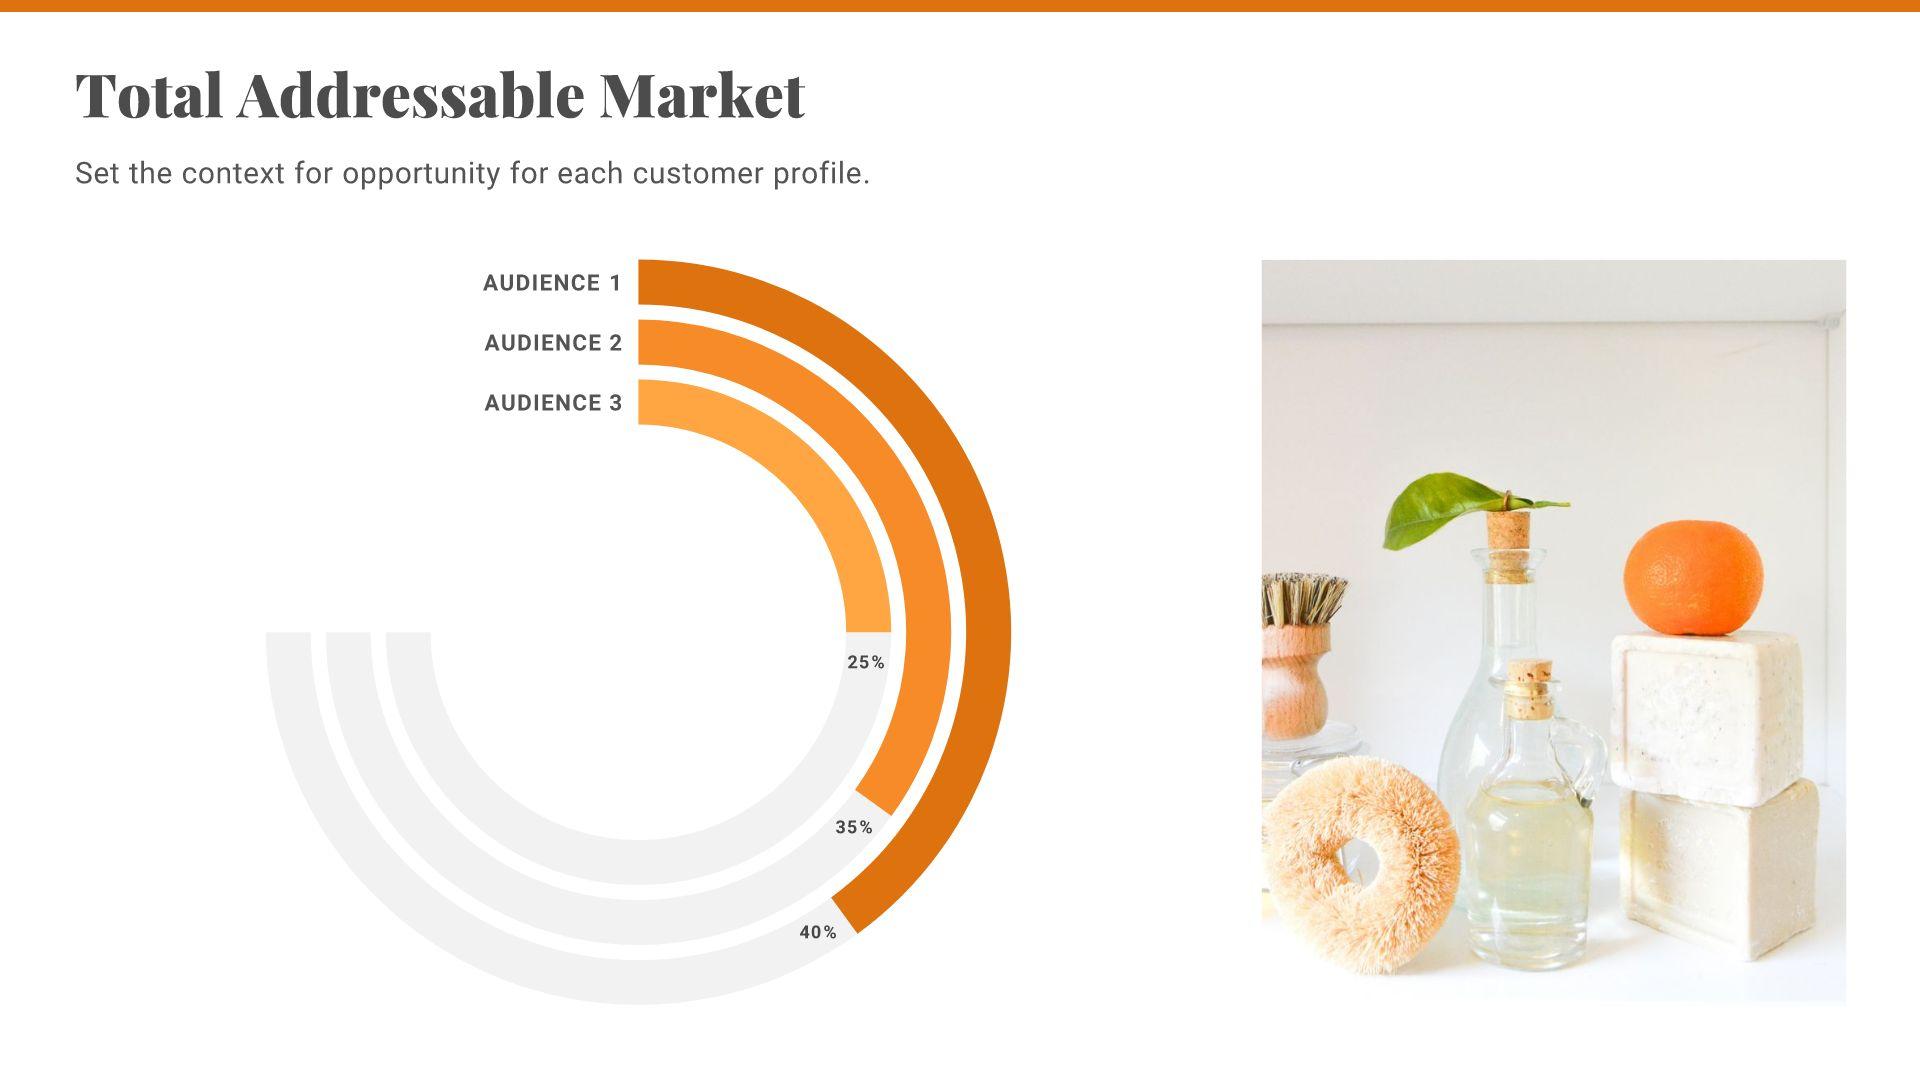 Addressable Market